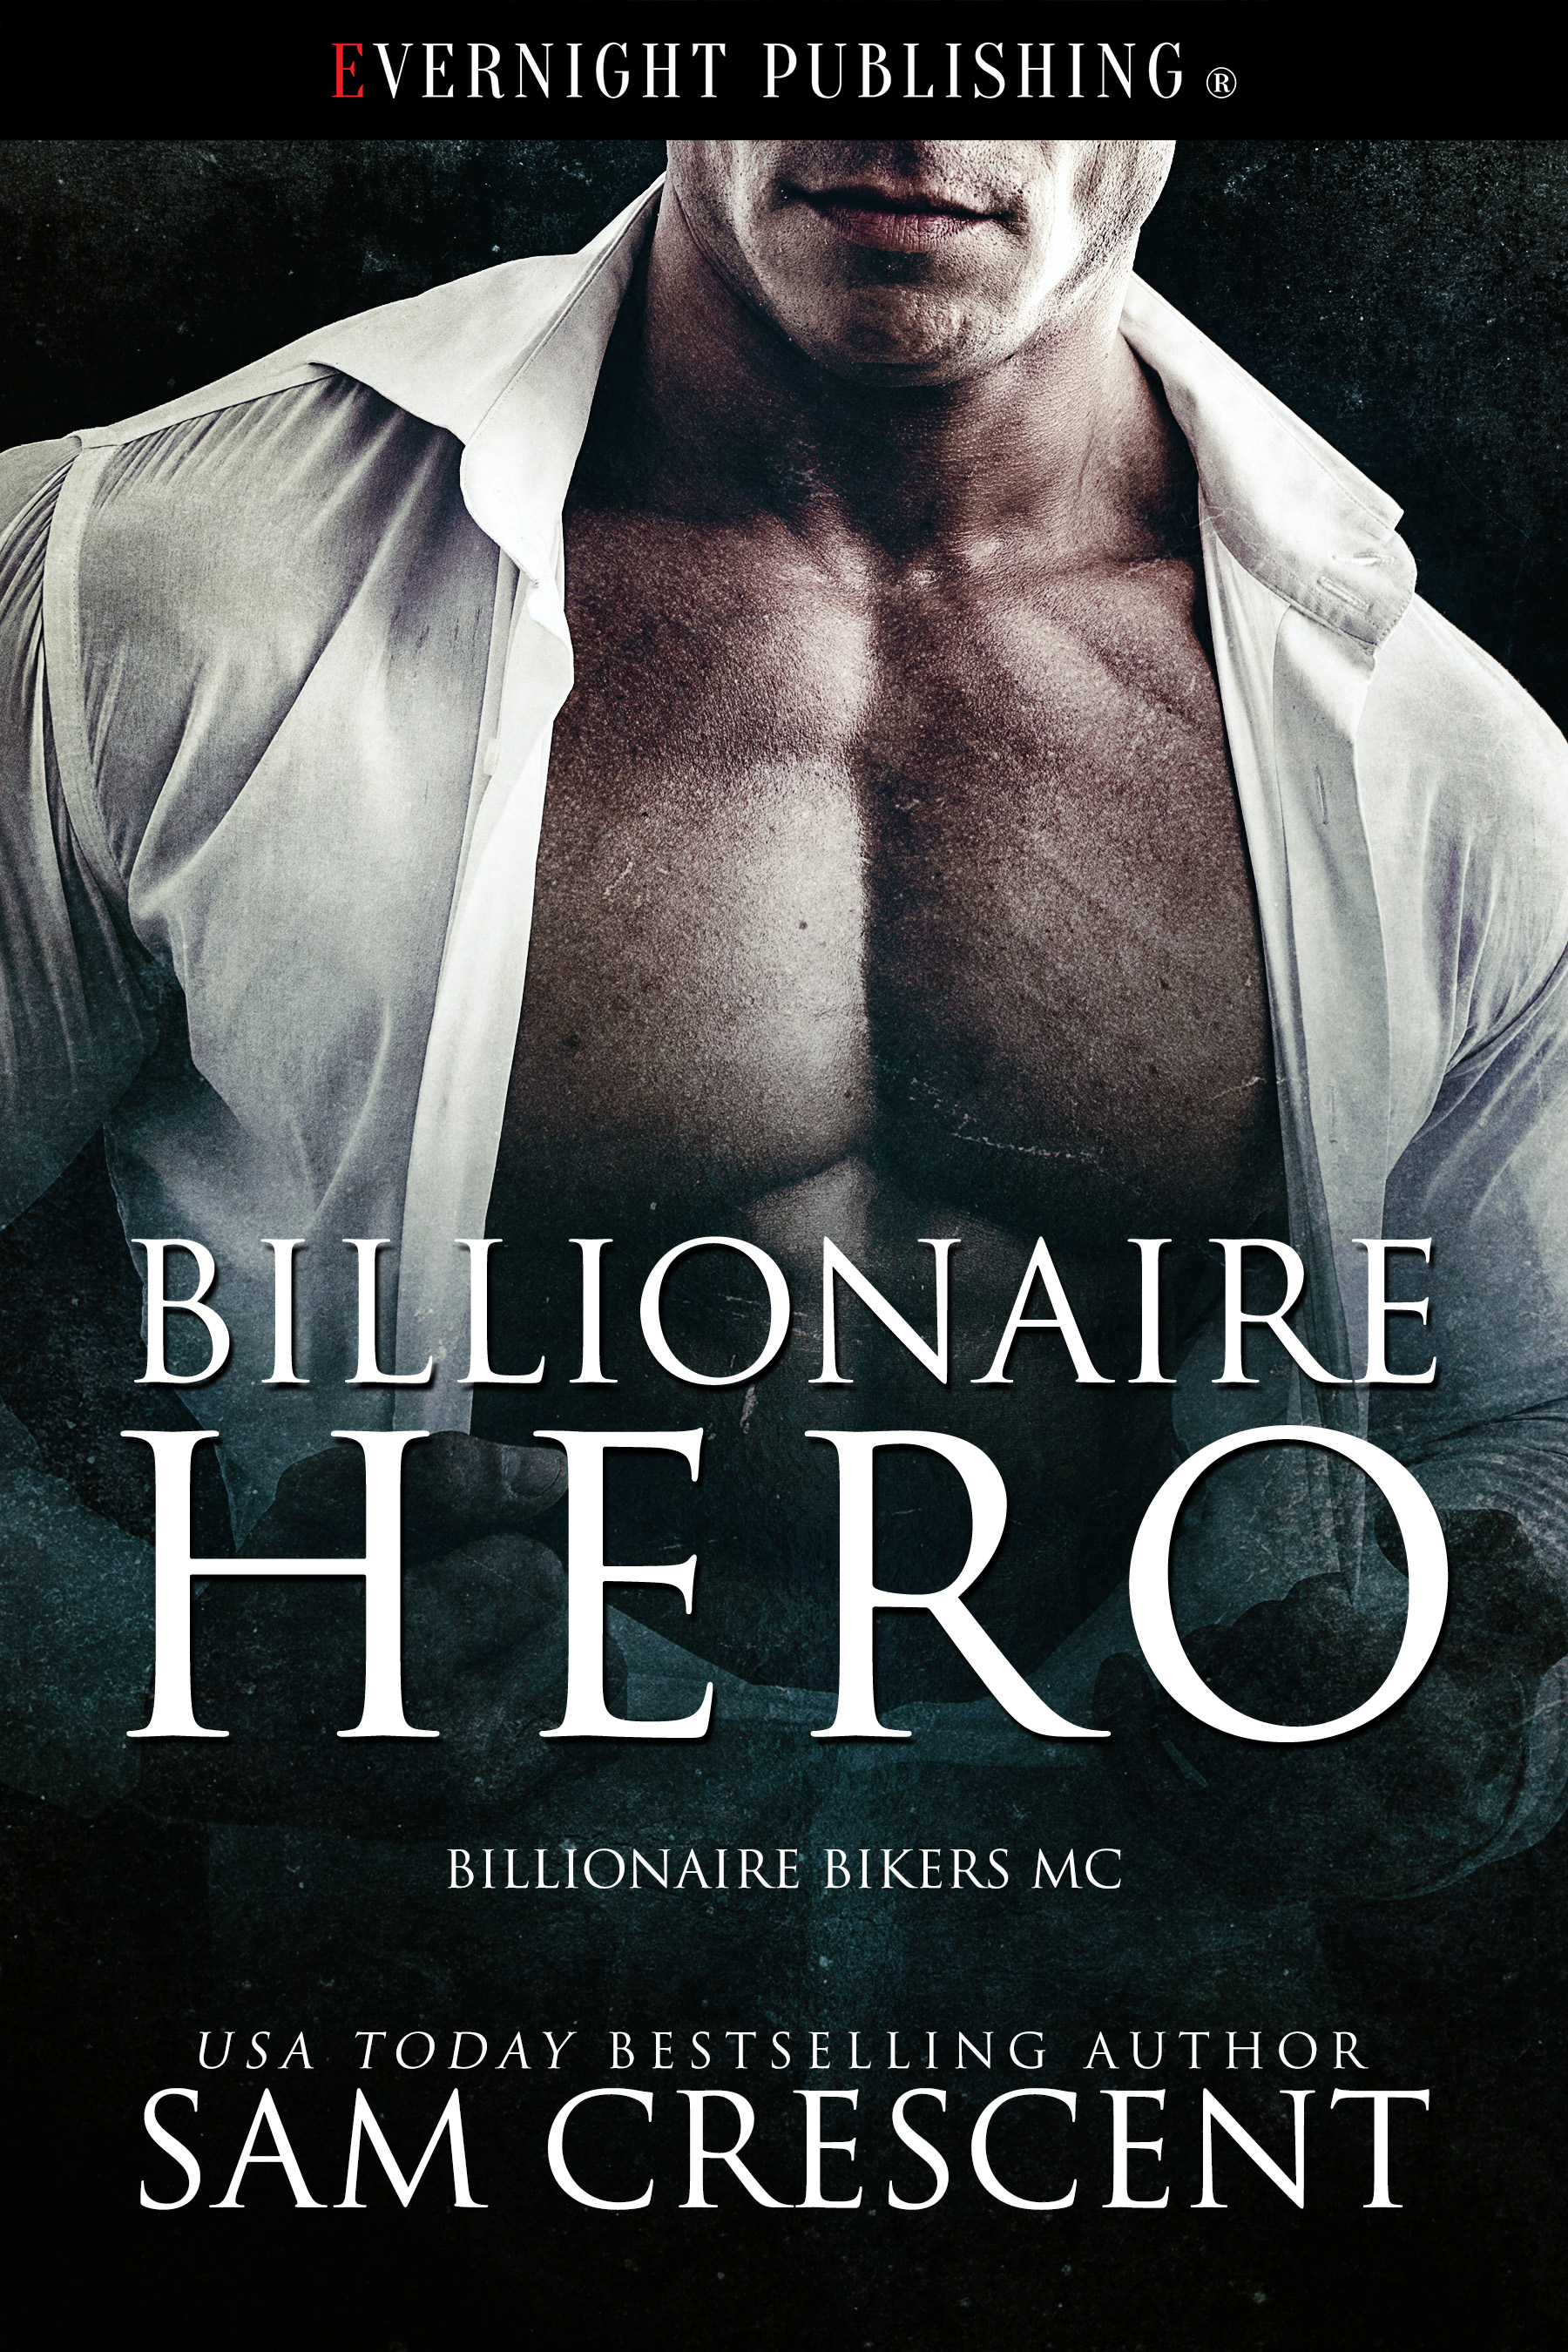 Billionaire-Hero-evernightpublishing-Sept2017